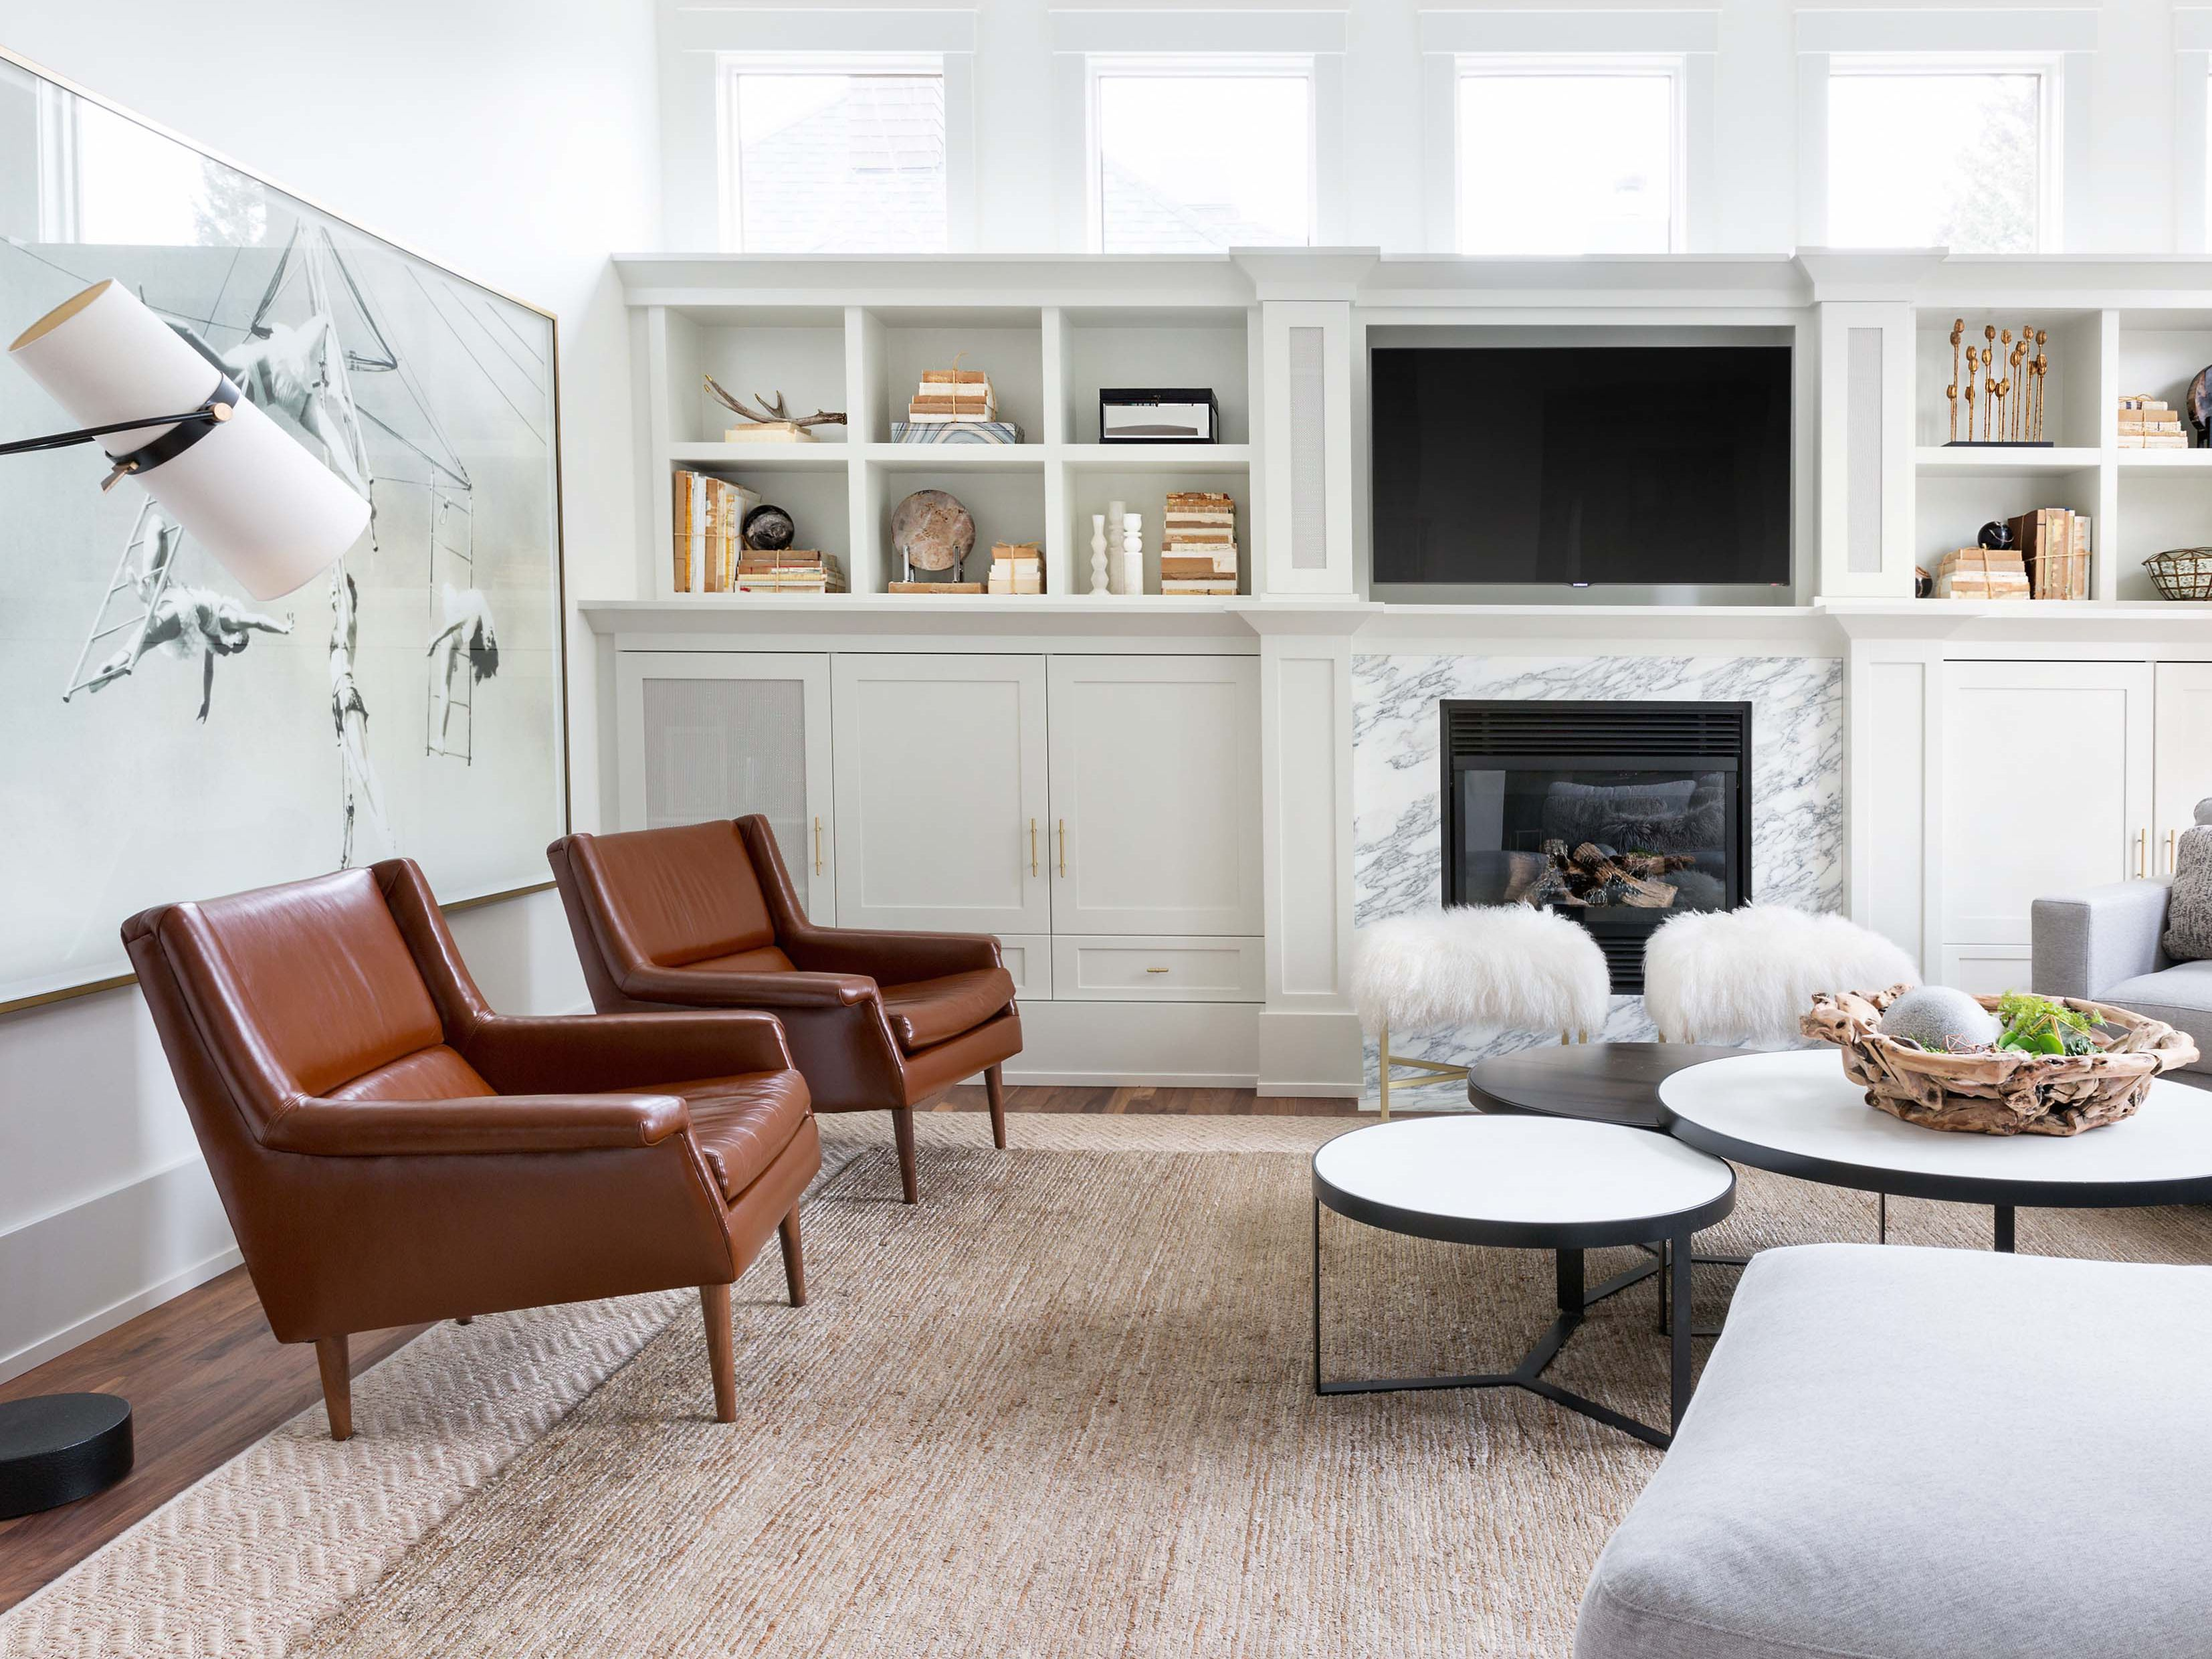 20 Beautiful Living Room Built In Ideas, Living Room Built Ins Ideas